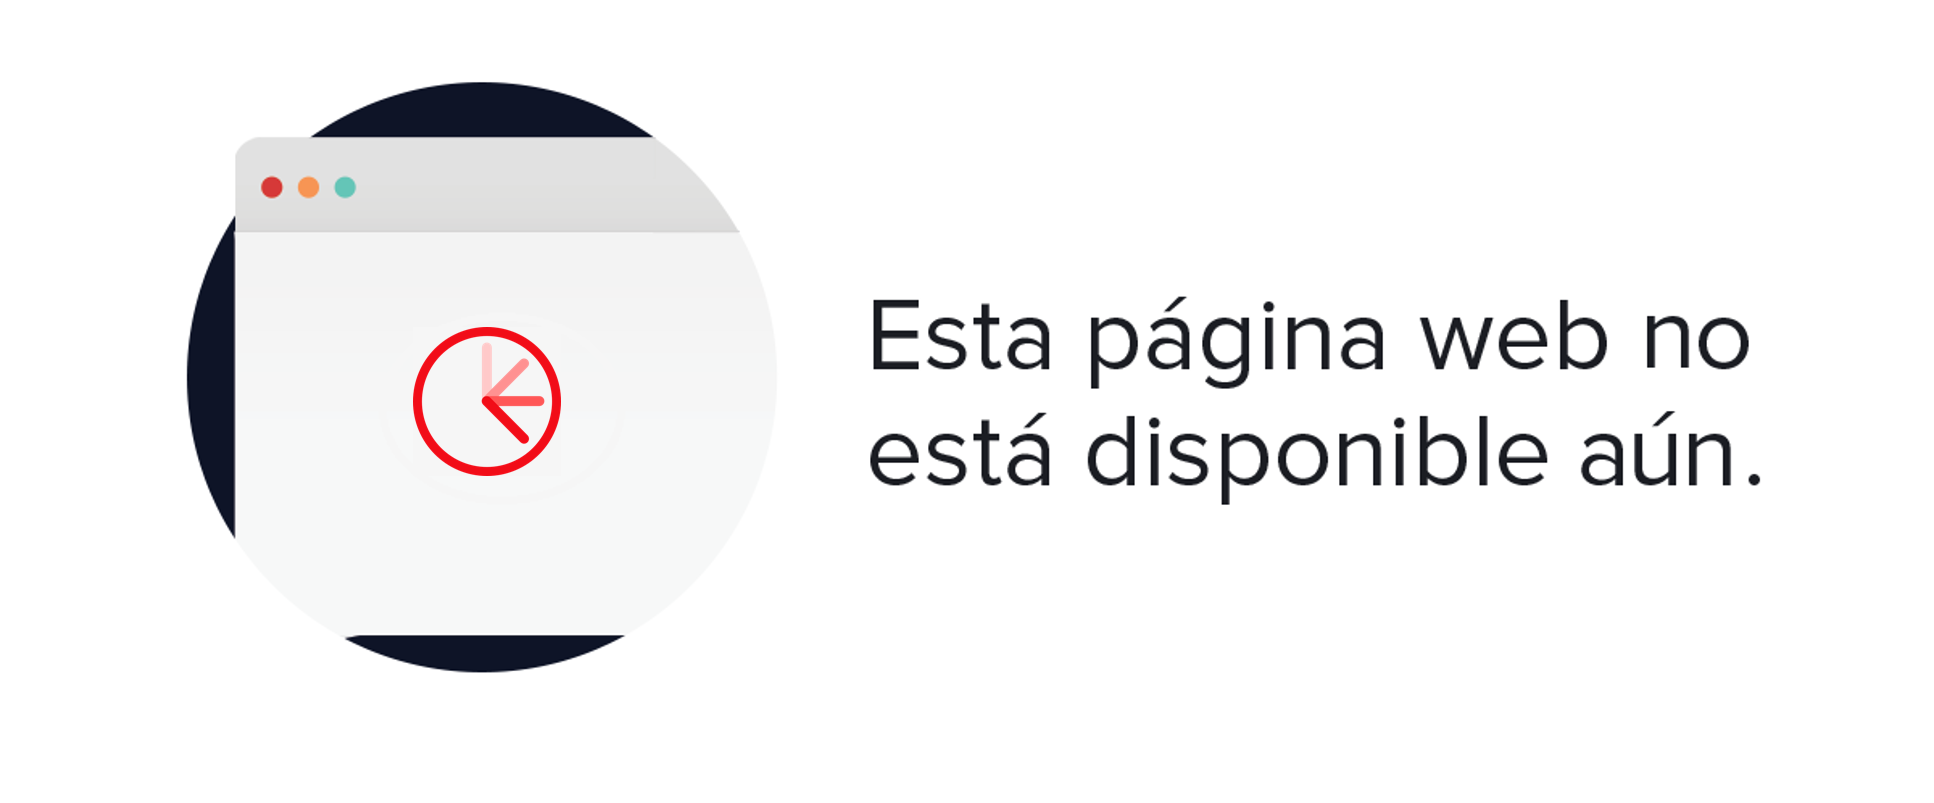 Adolfo Dominguez - Pantalón de mujer Adolfo Dominguez azul marino capri Azul marino 8433917417487 - WQTLVXH